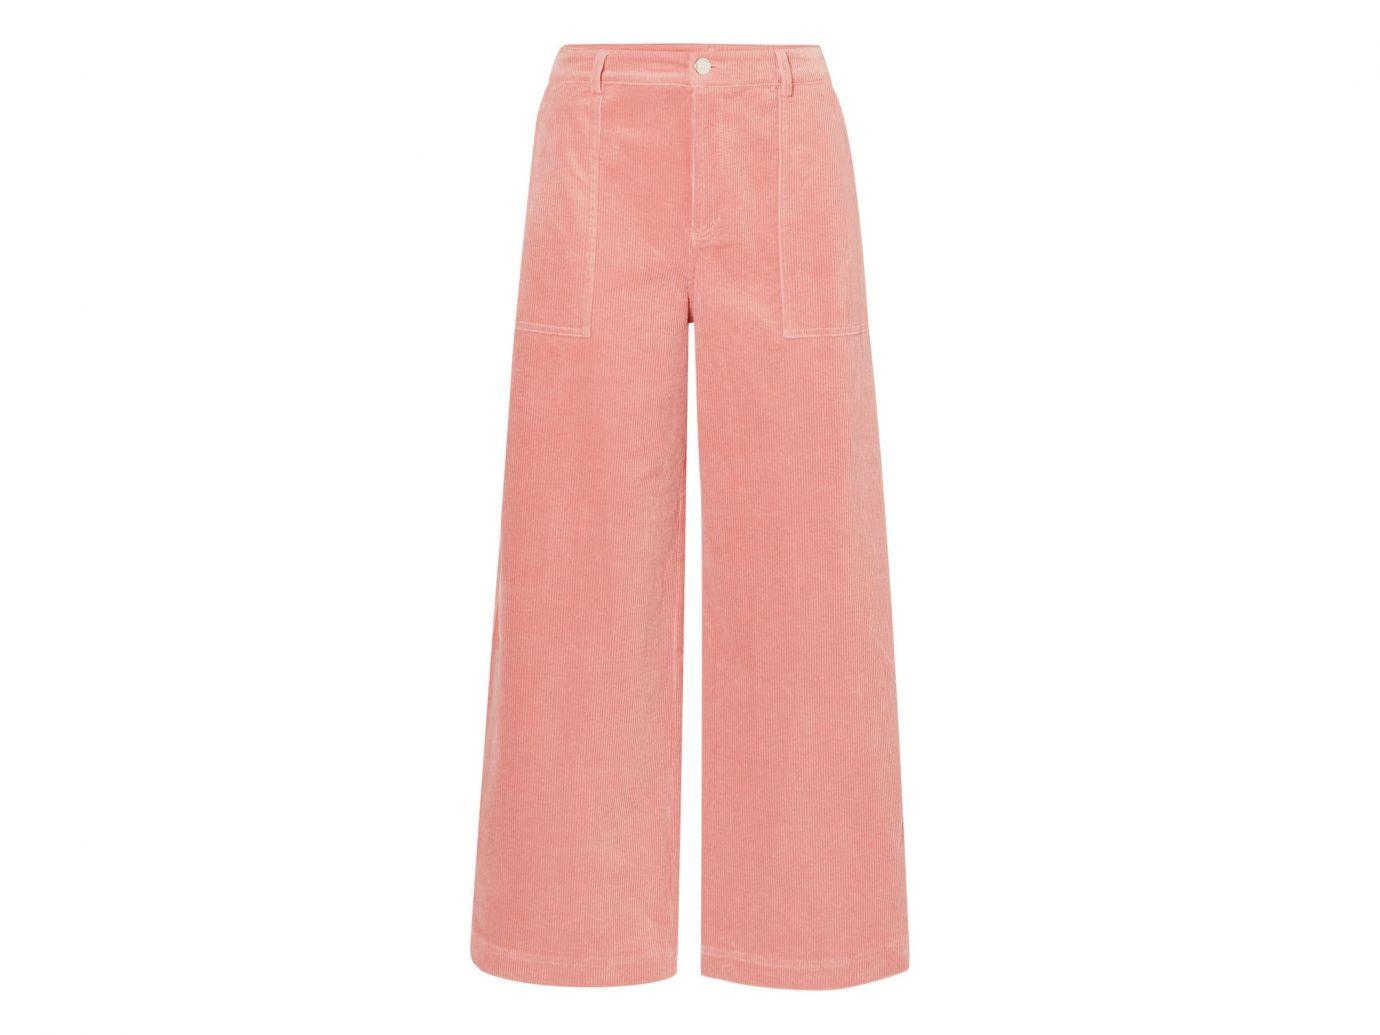 Ganni Ridgewood cotton-blend corduroy wide-leg pants